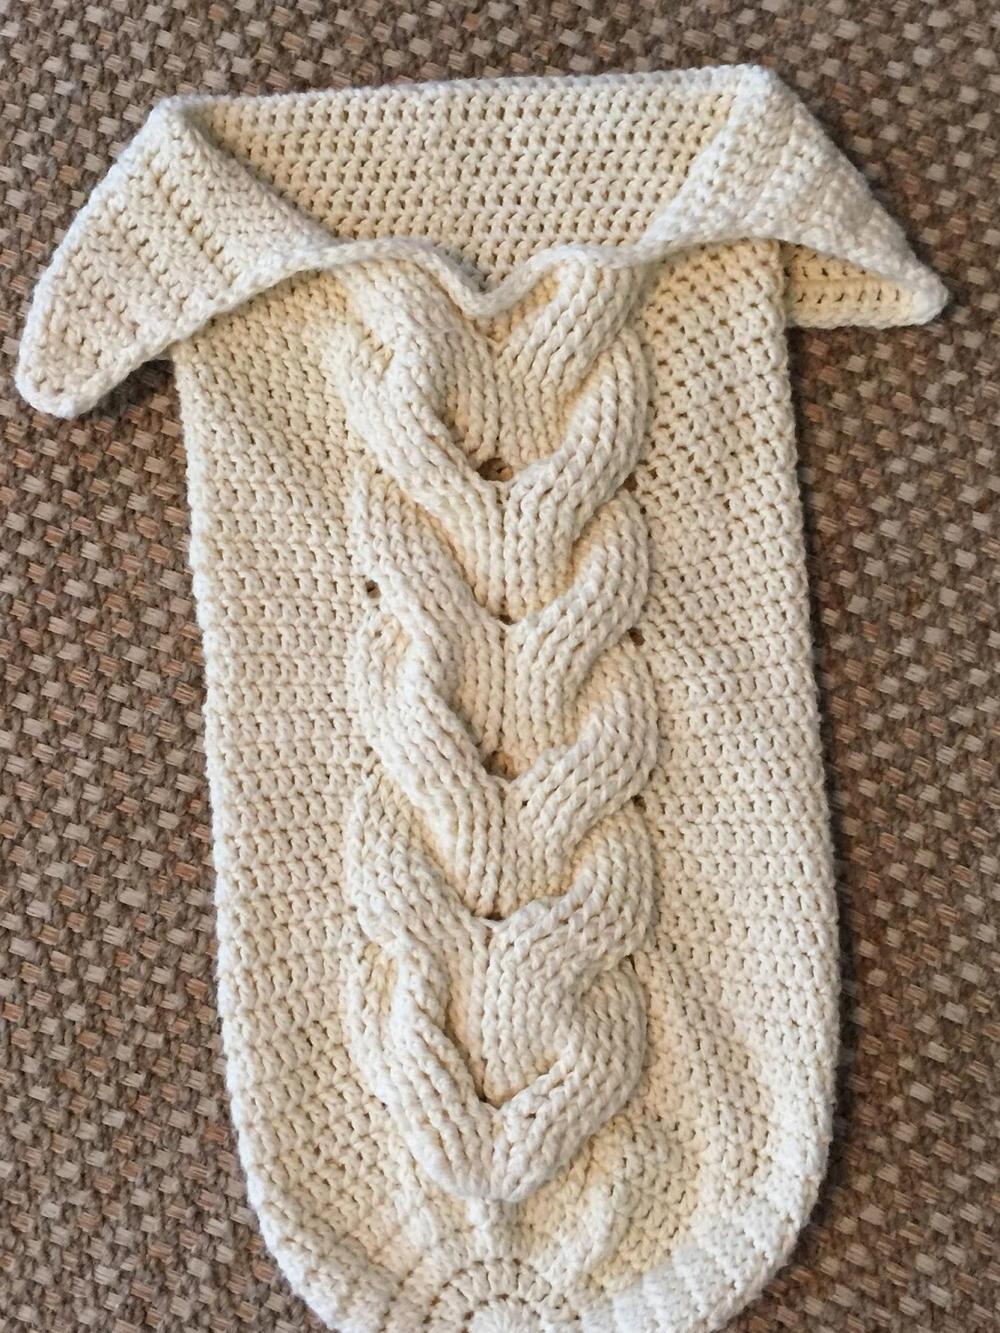 Charity Crochet Patterns